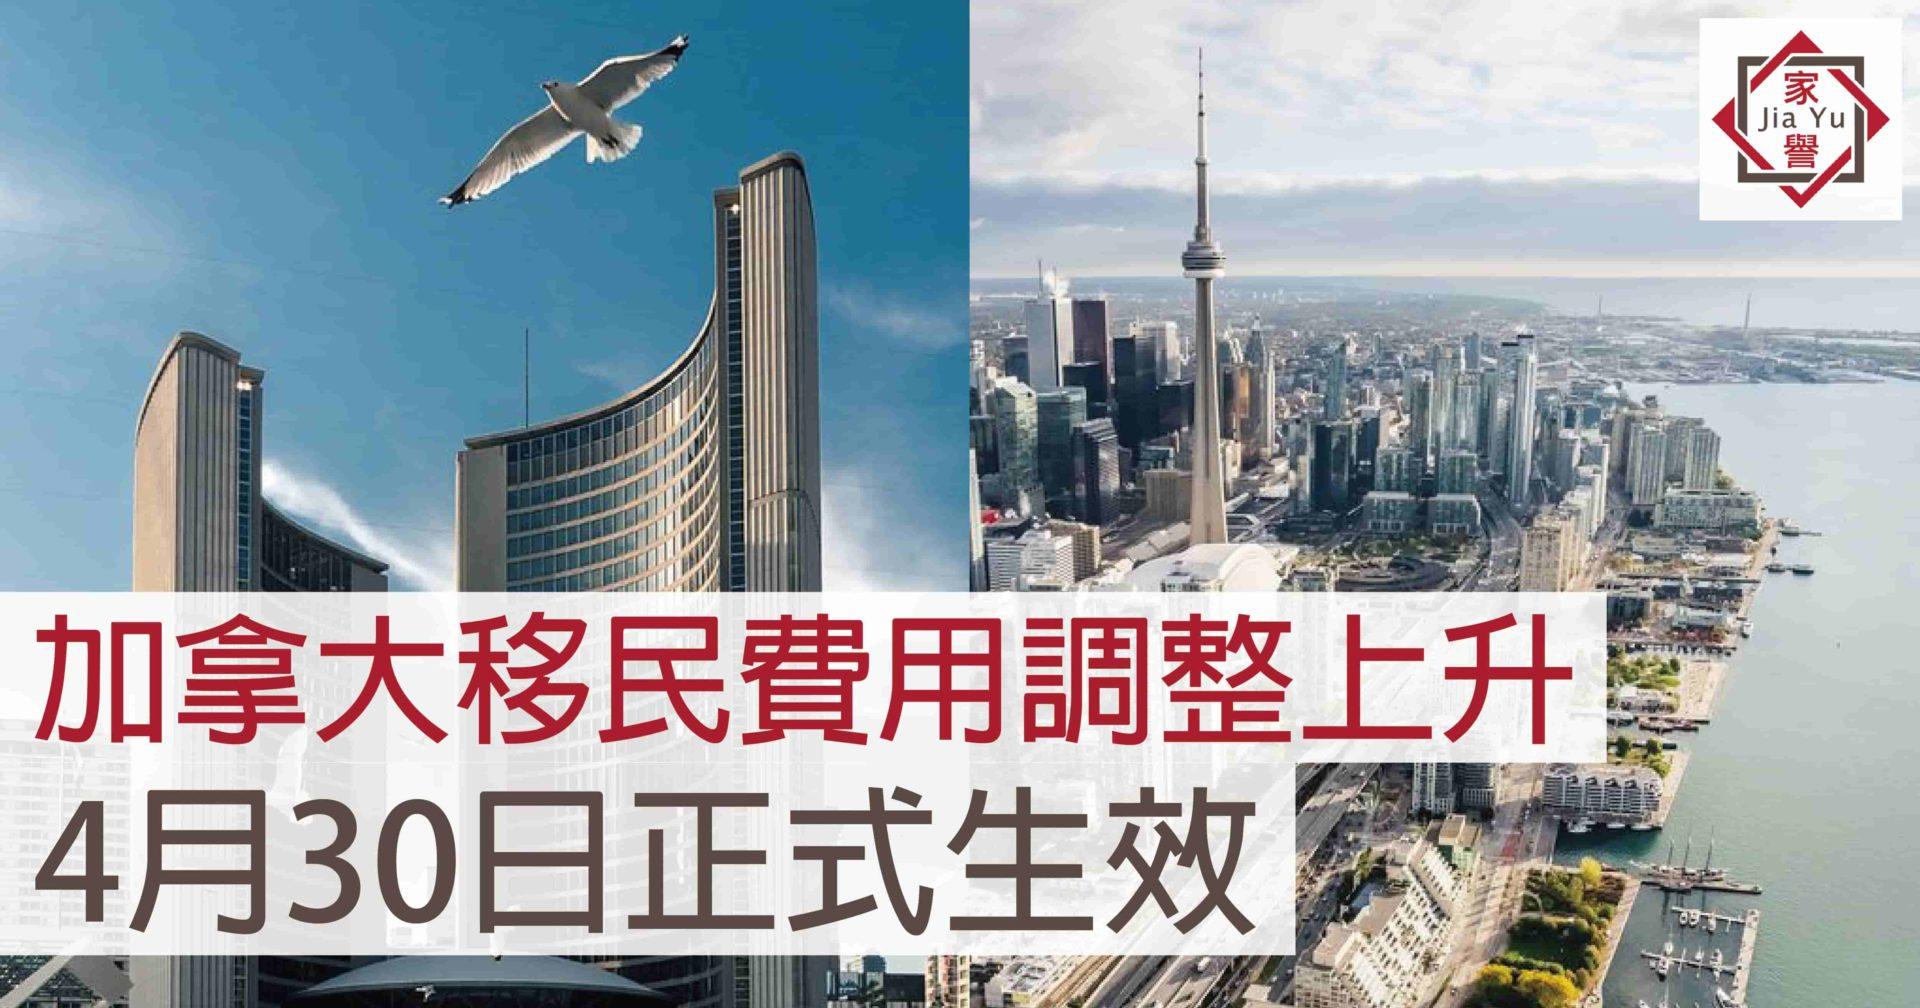 Canada Immigration Fee Adjustment | JiaYu